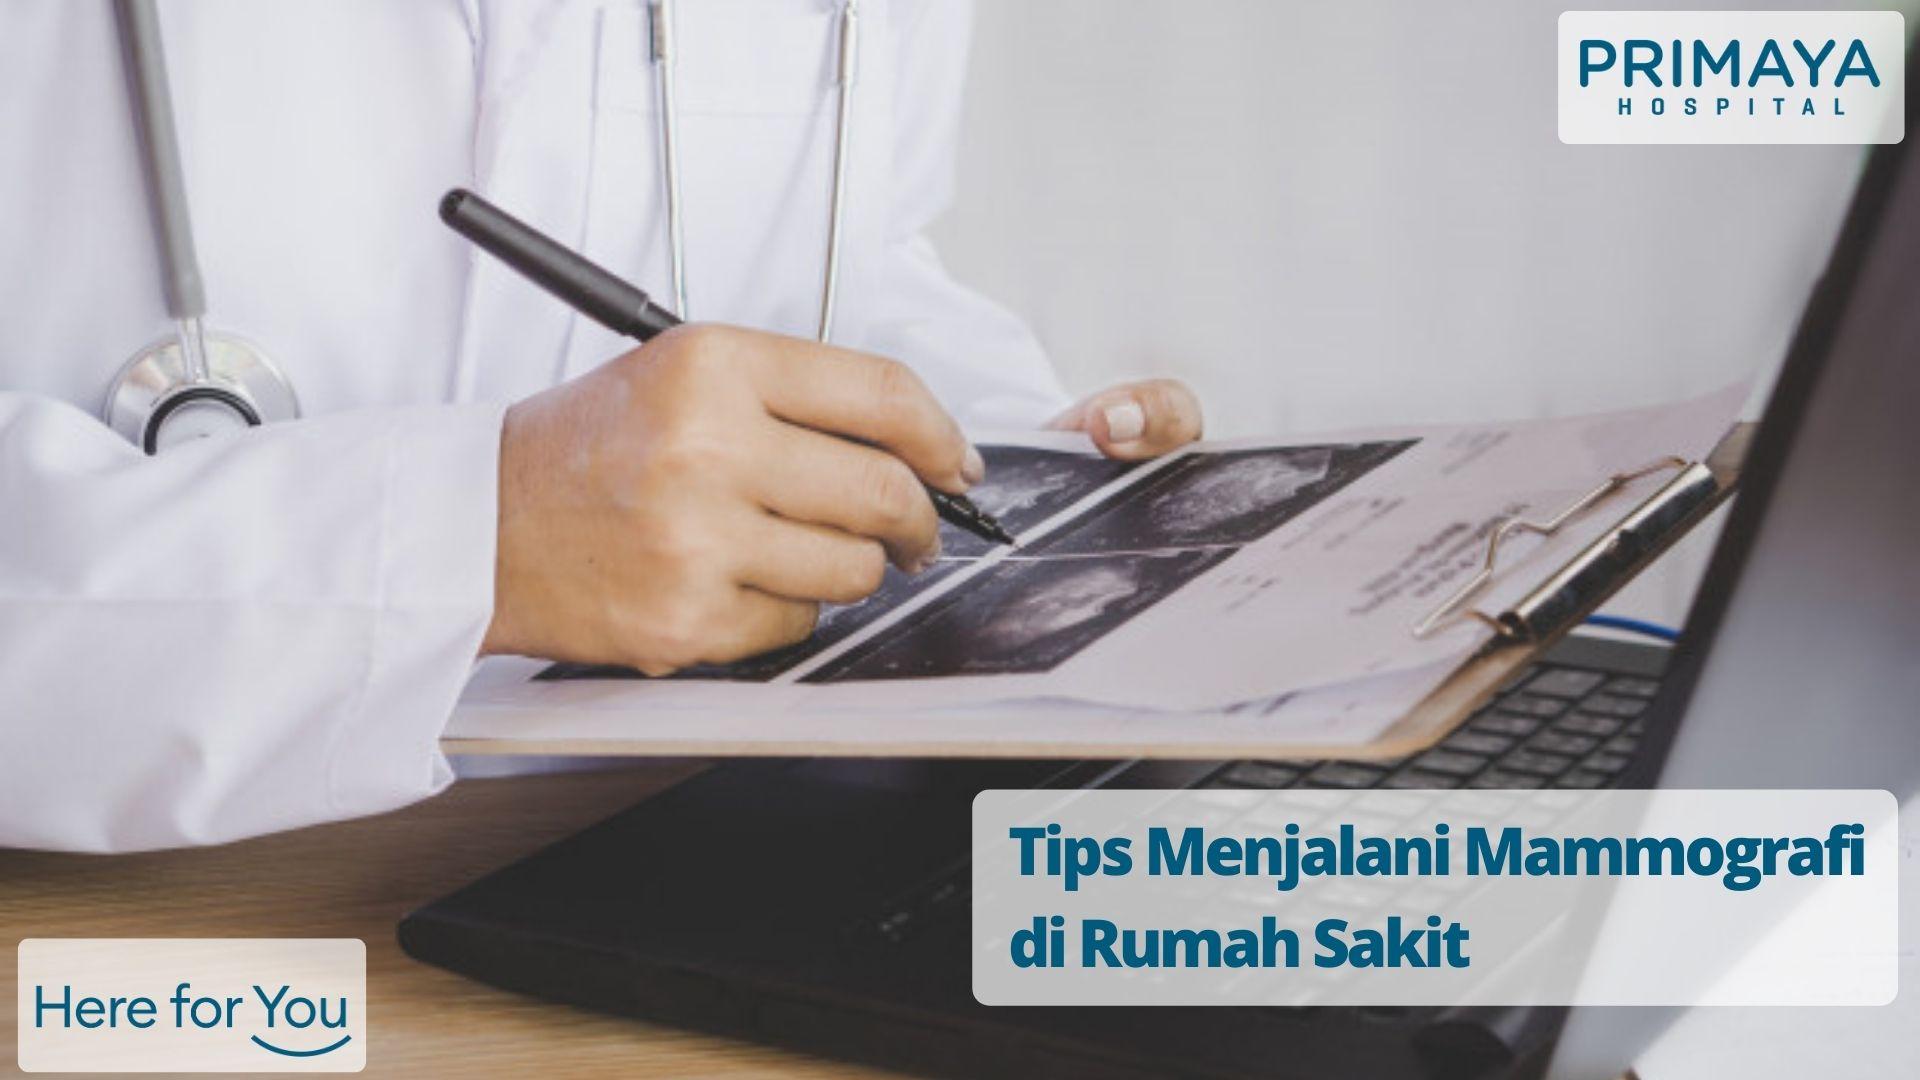 Tips Menjalani Mammografi di Rumah Sakit